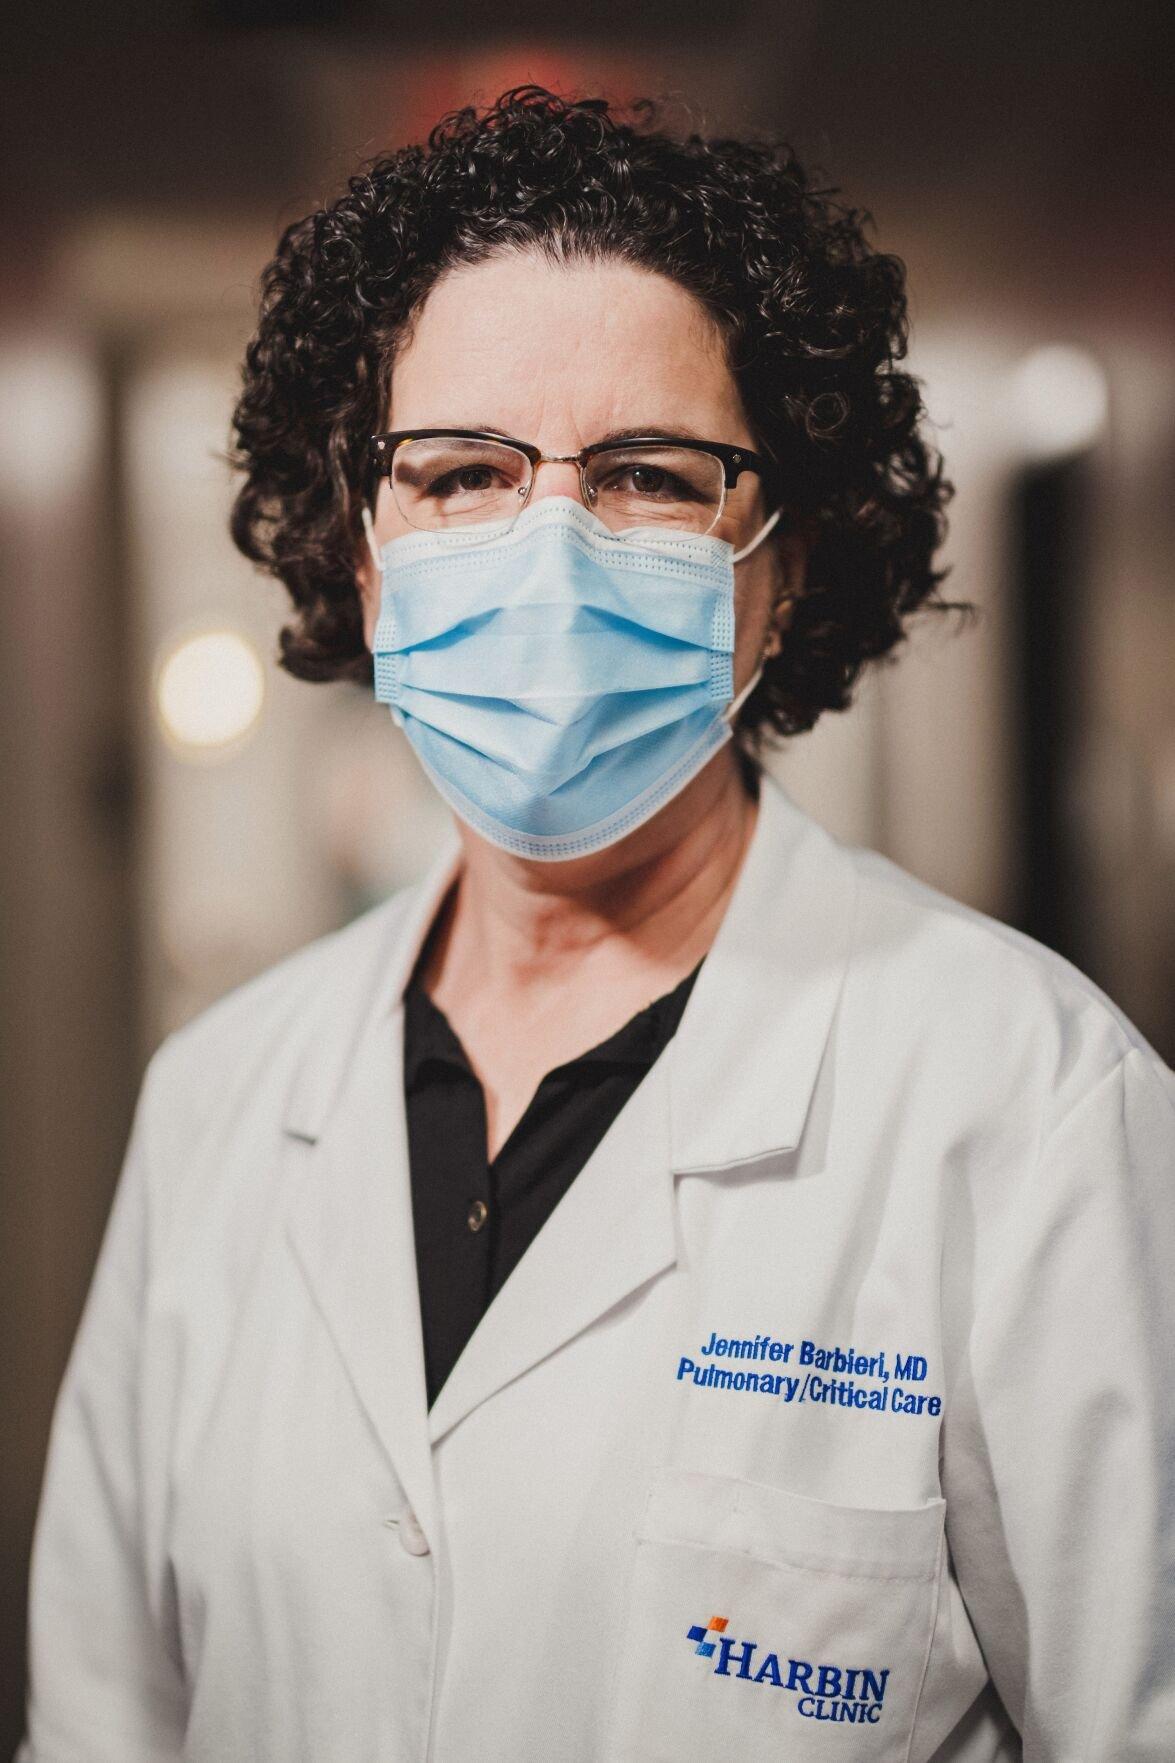 Pulmonologist Dr. Jennifer Barbieri, MD, FCCP